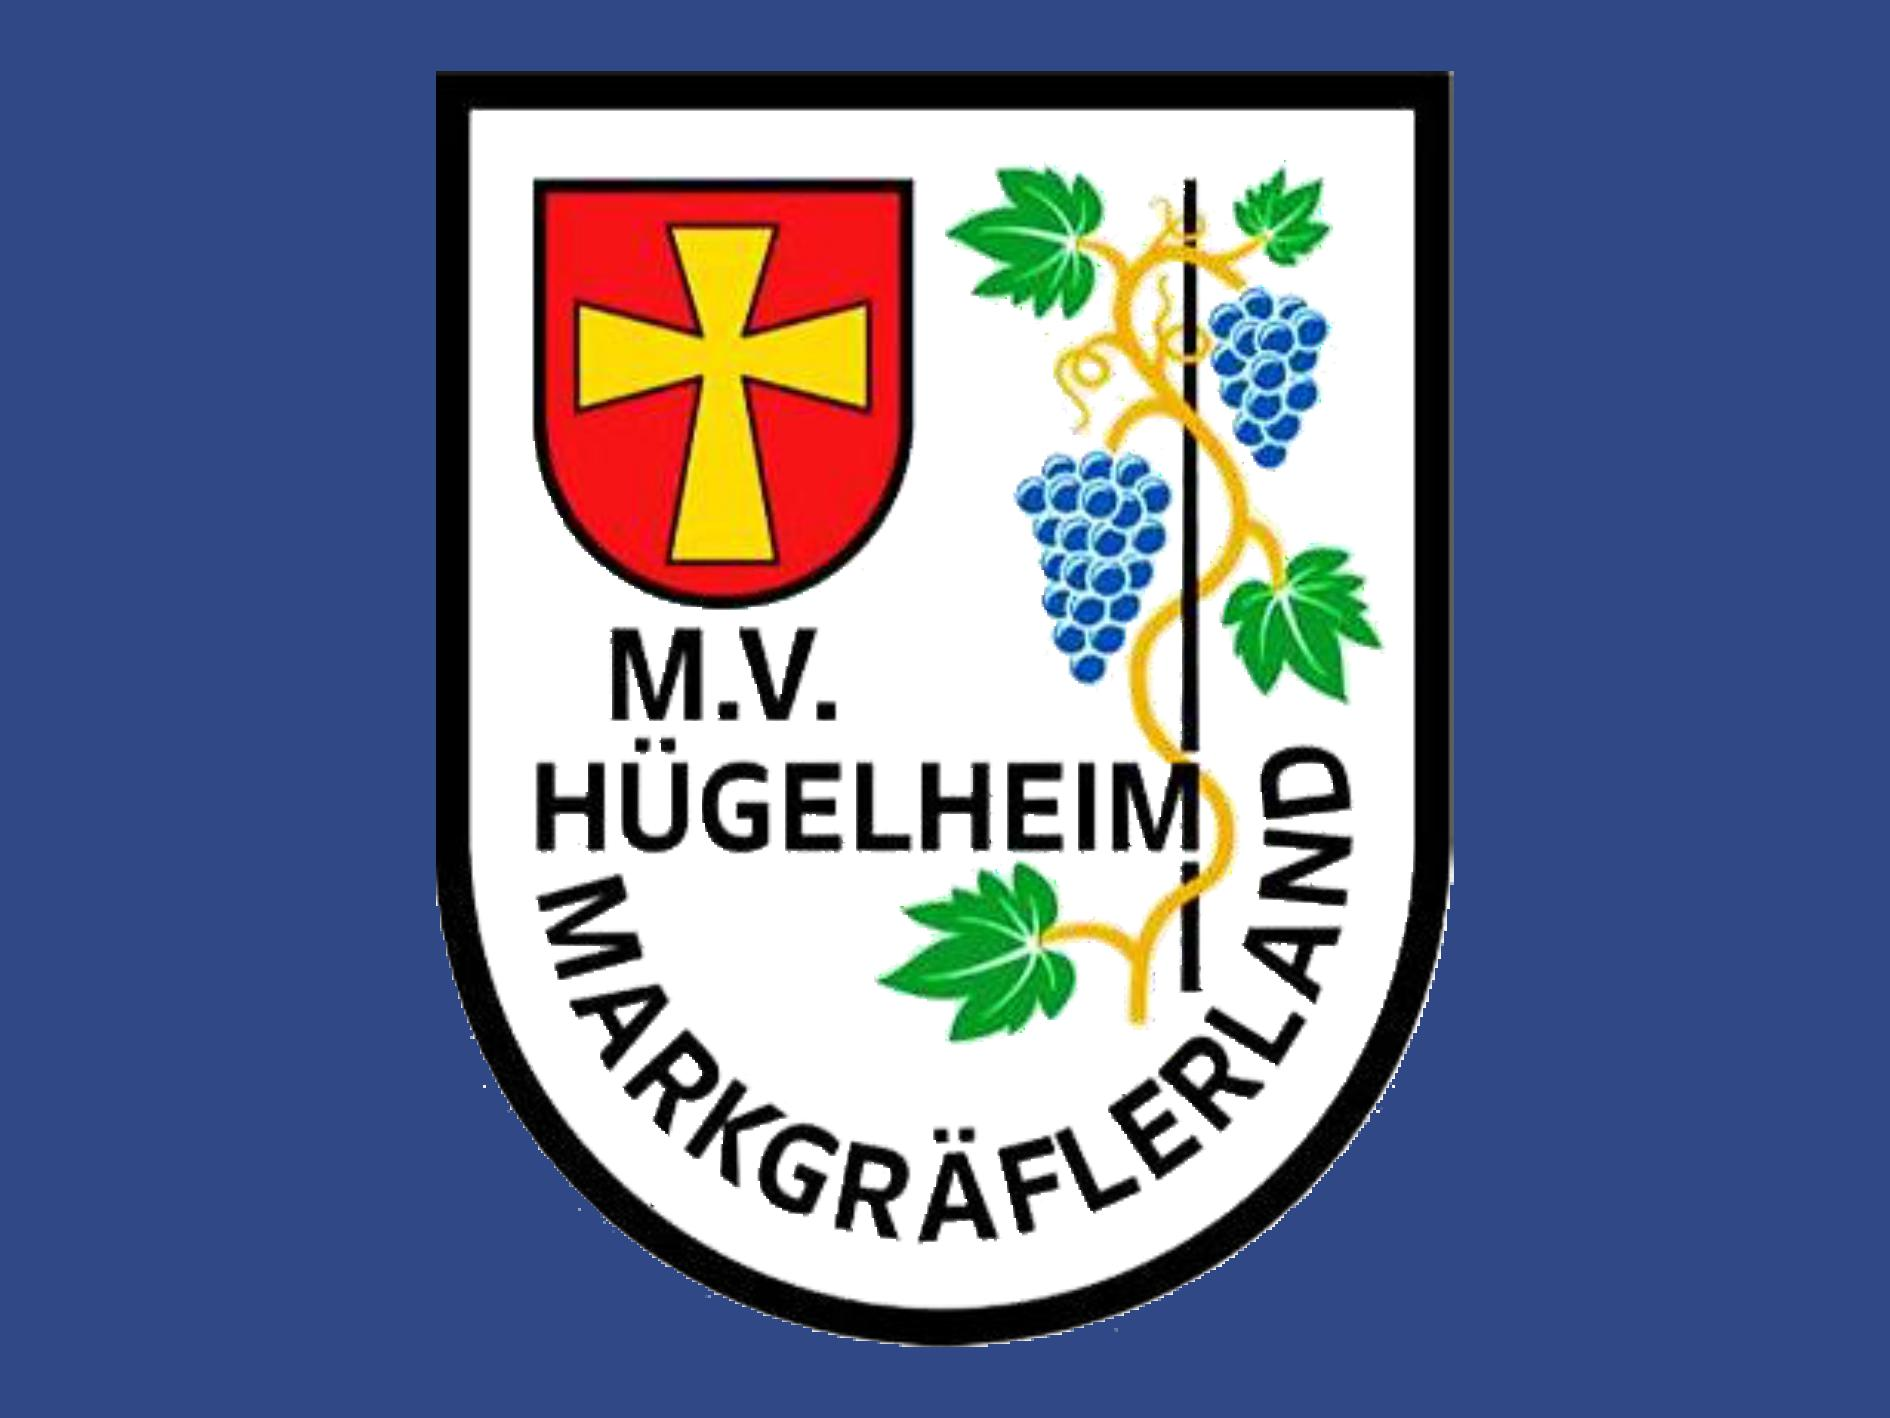 Musikverein Hügelheim